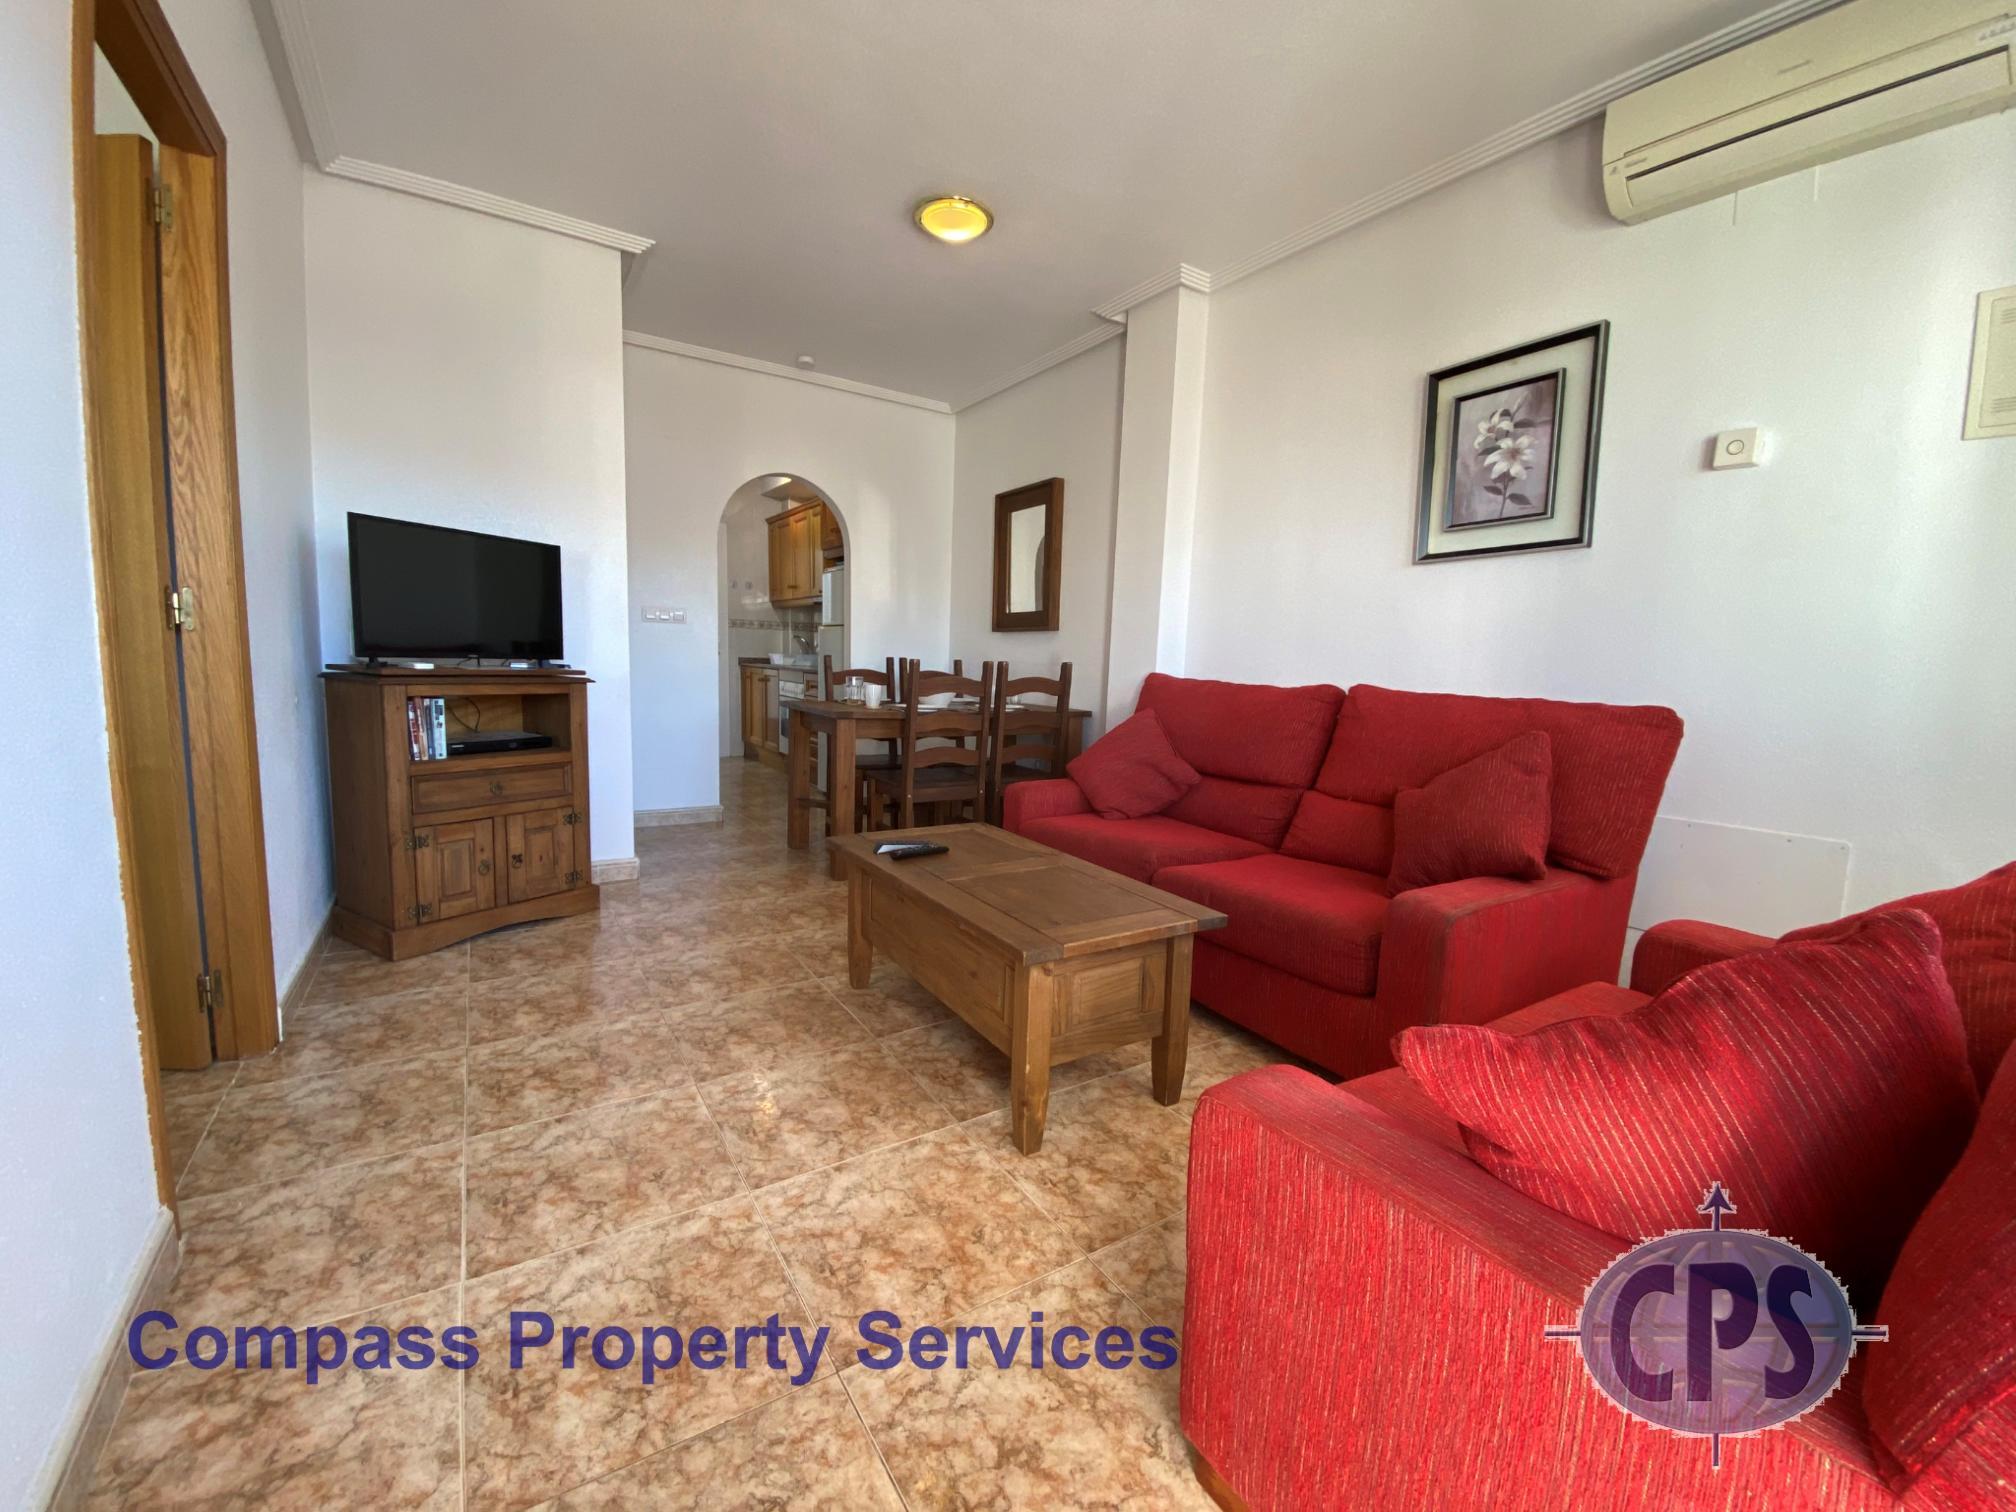 Apartment La Cinuelica R3 1st flr apt overlooking pool l149 photo 28556784